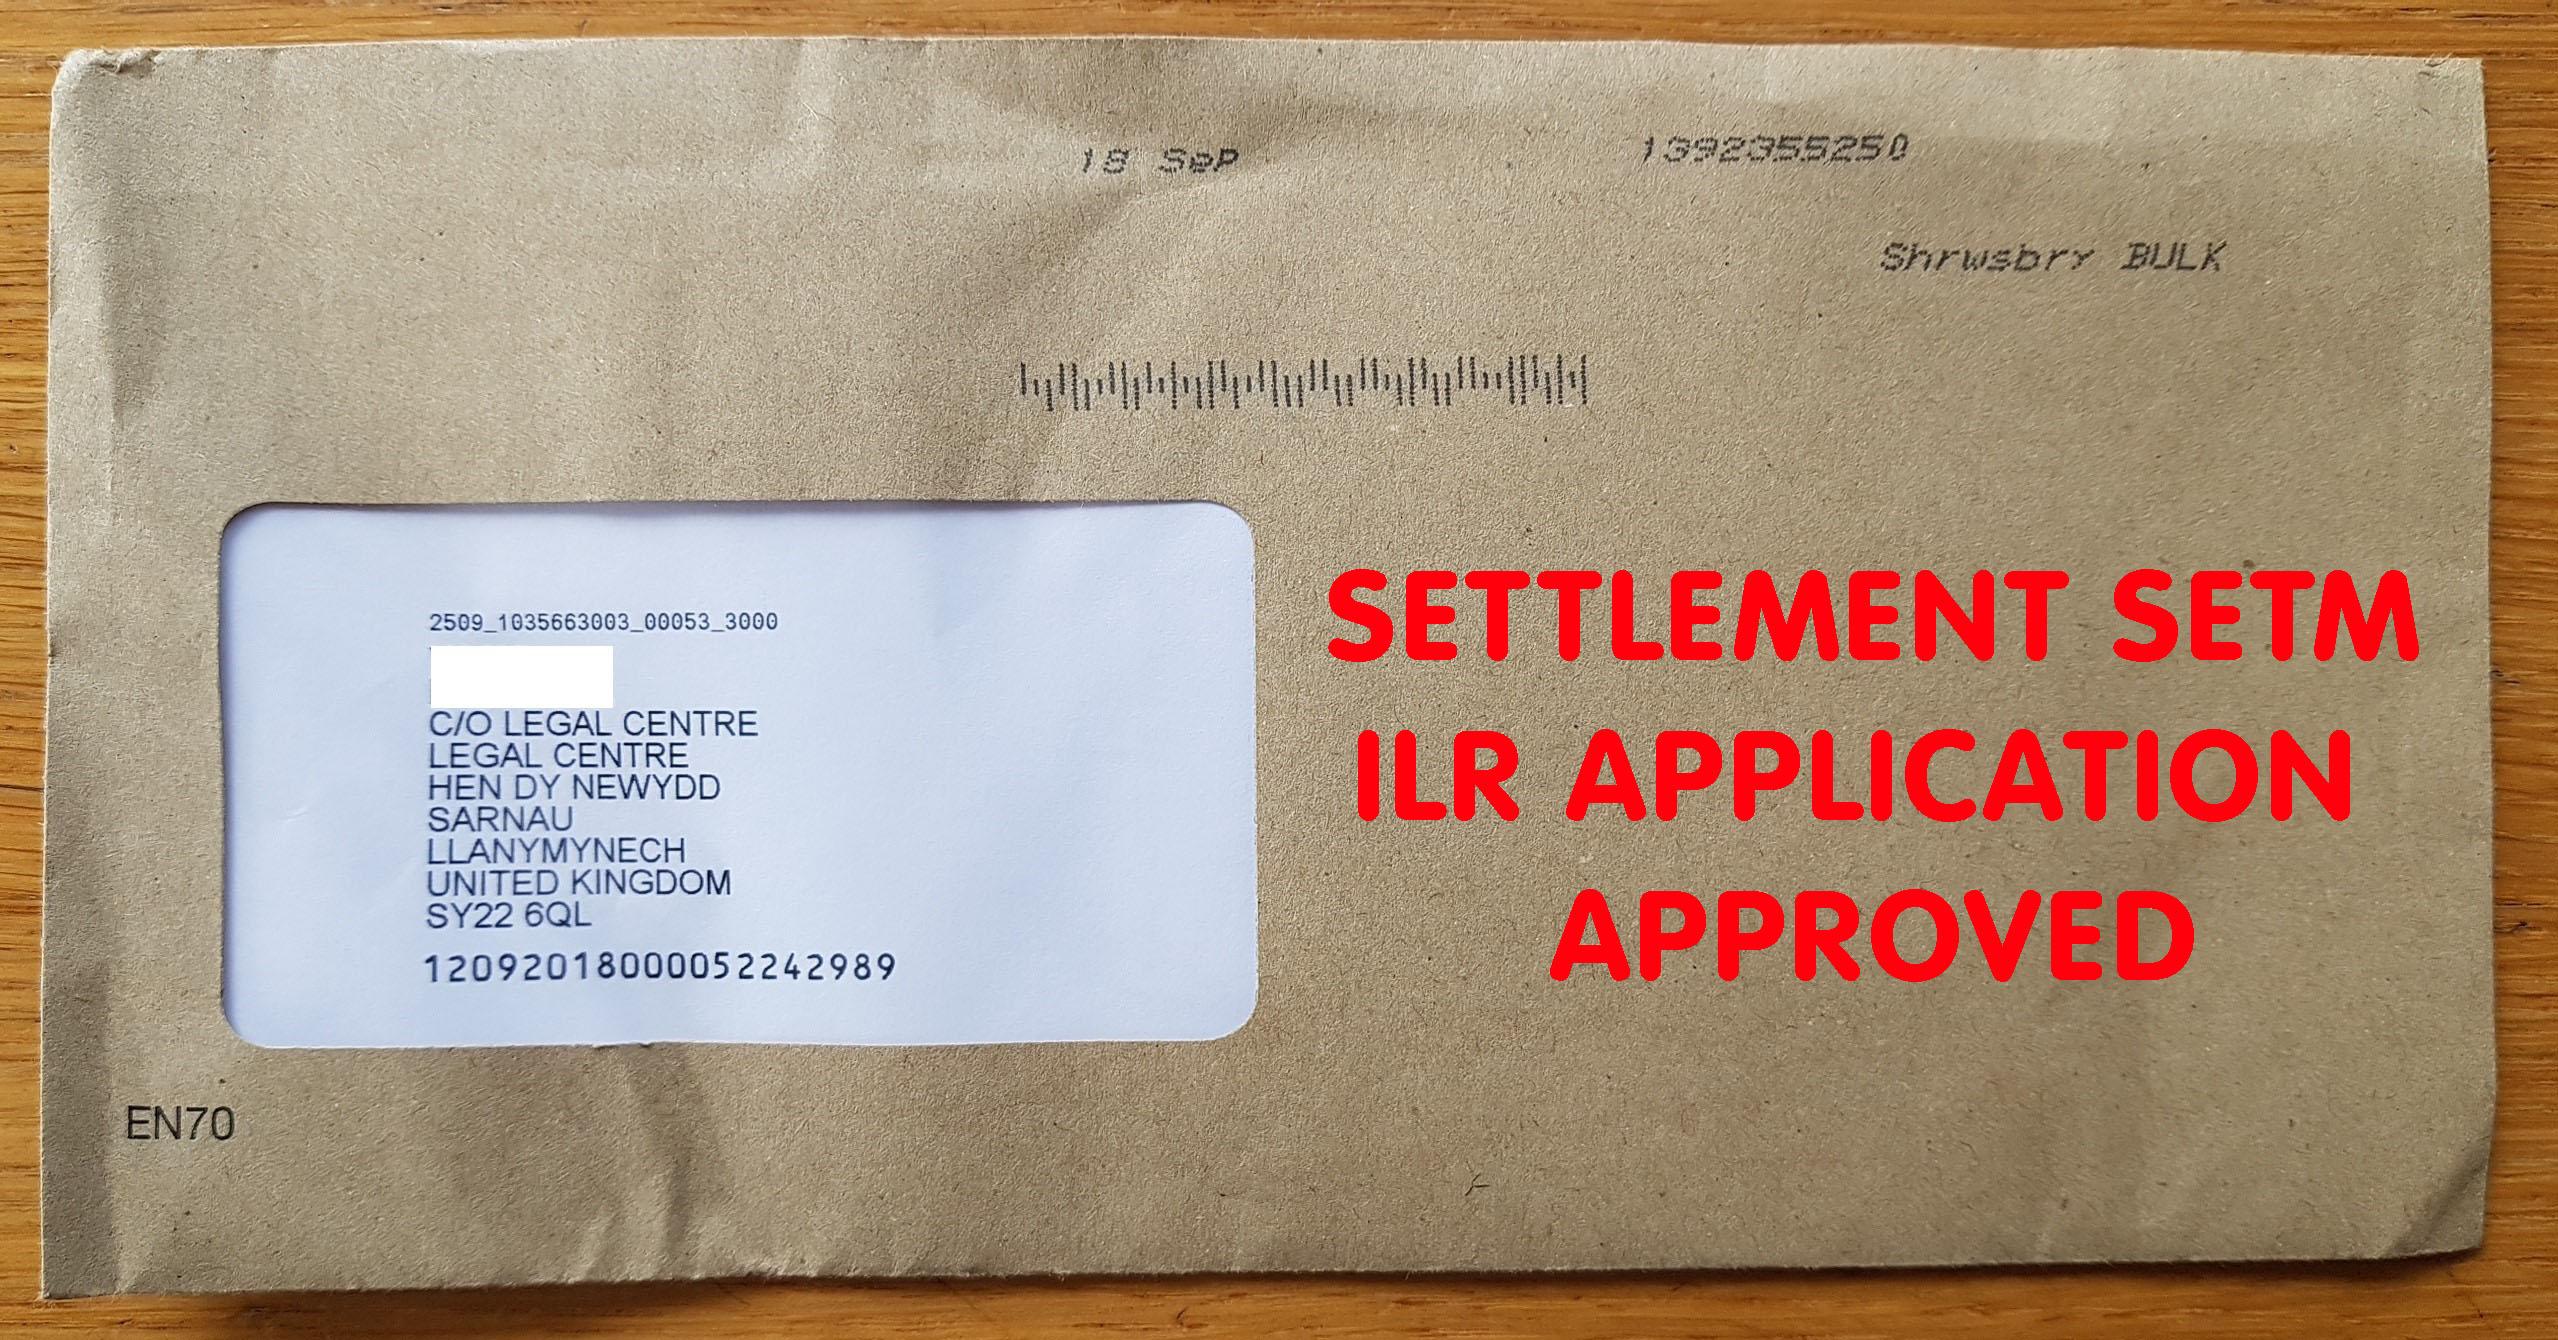 SETM_settlement_application_approved_thanks_to_Legal_Centre_Anton_Koval_07791145923_www.legalcentre.jpg